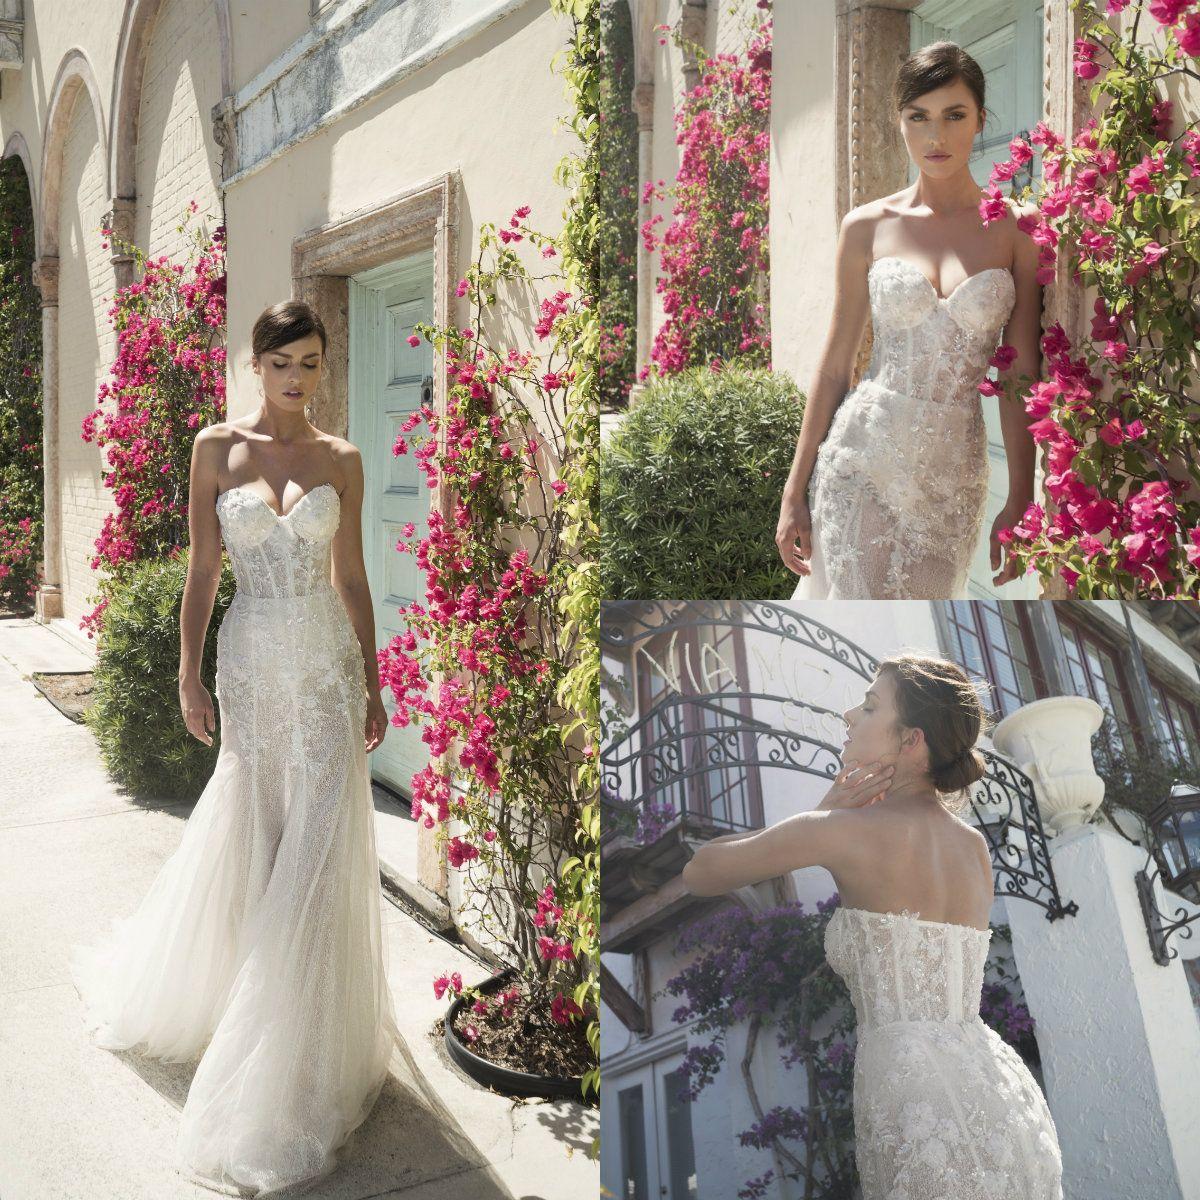 2019 Lindo Sereia Vestidos de Noiva Ilusão Querida Exposto Desossa Apliques de Noiva Vestidos de Lantejoulas Com Zíper de Volta Vestido de Noiva de Tule